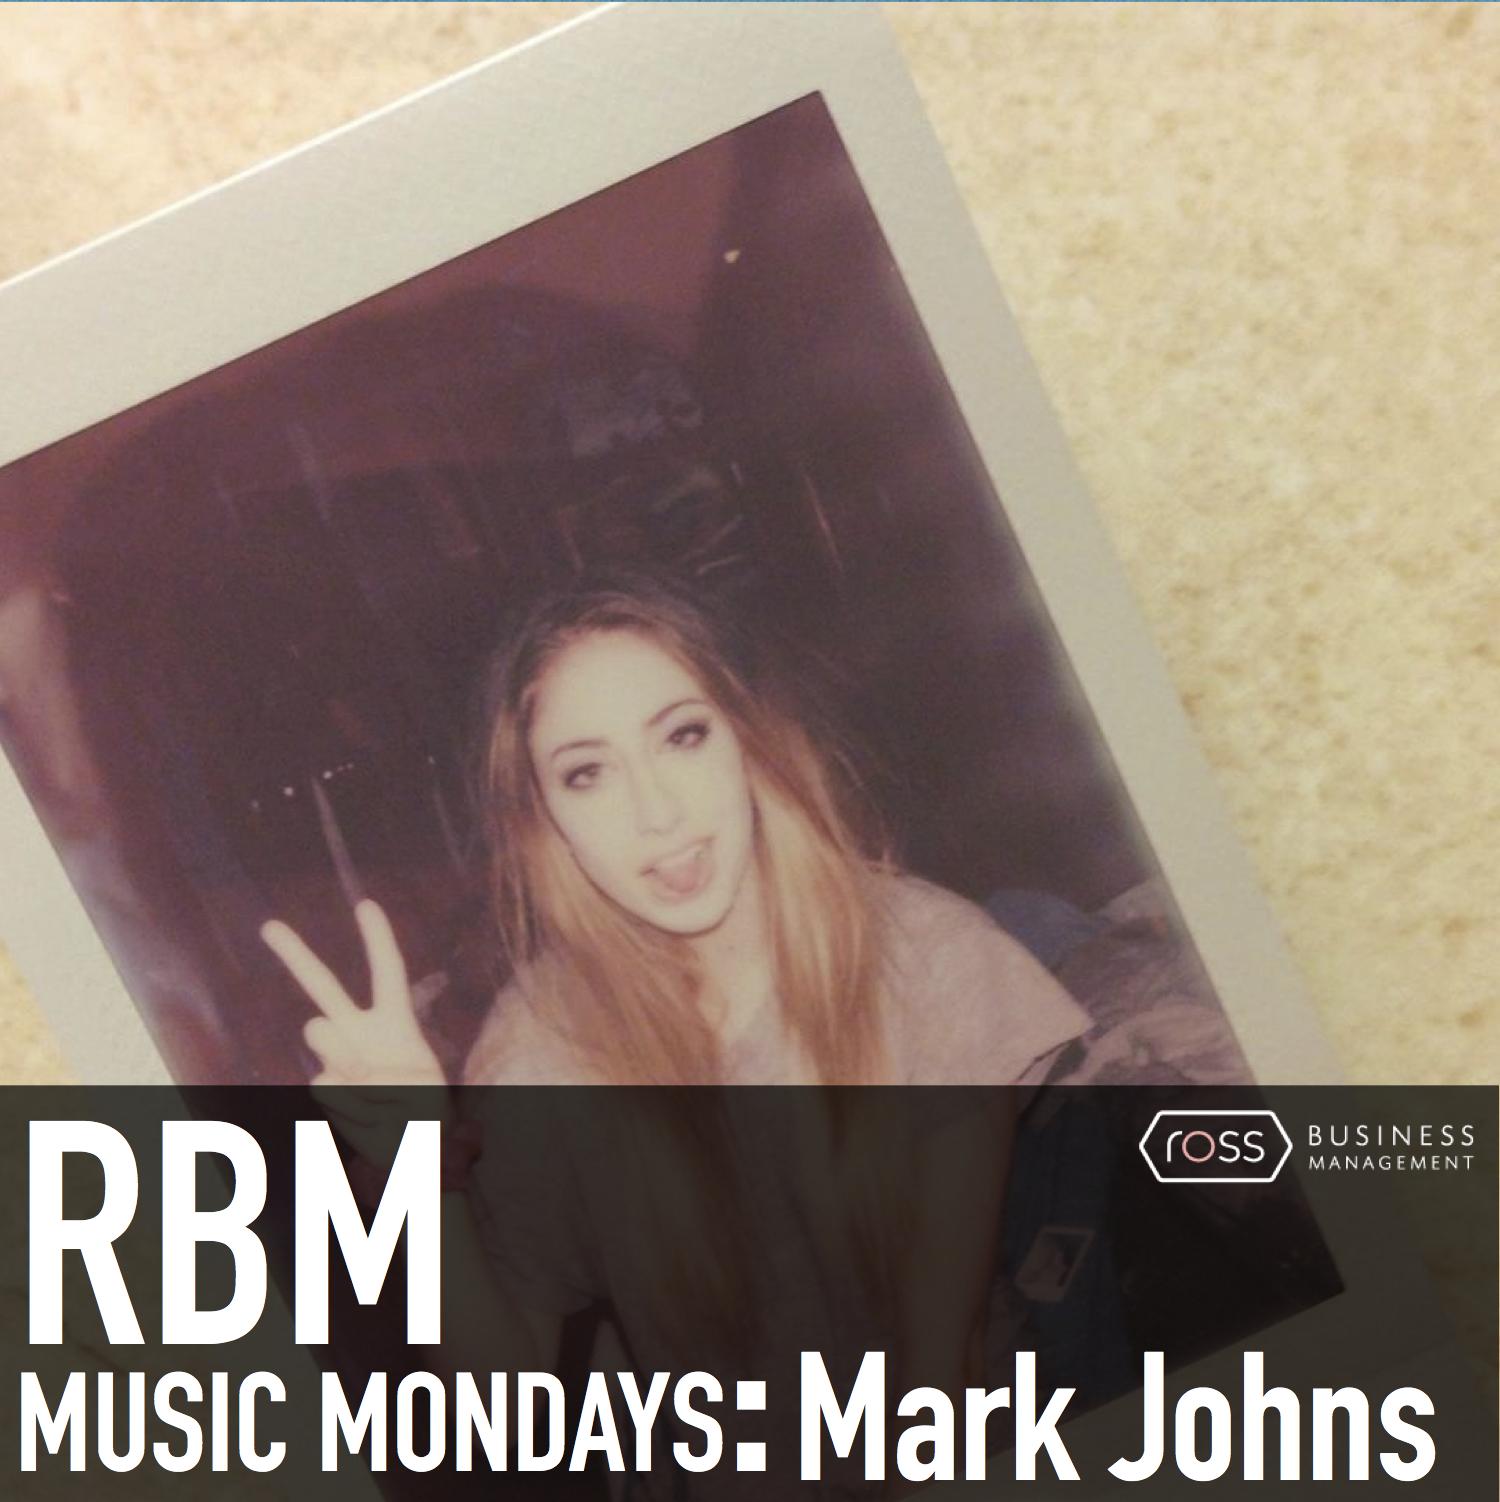 RBM-Music-Monday-Mark-Johns.png